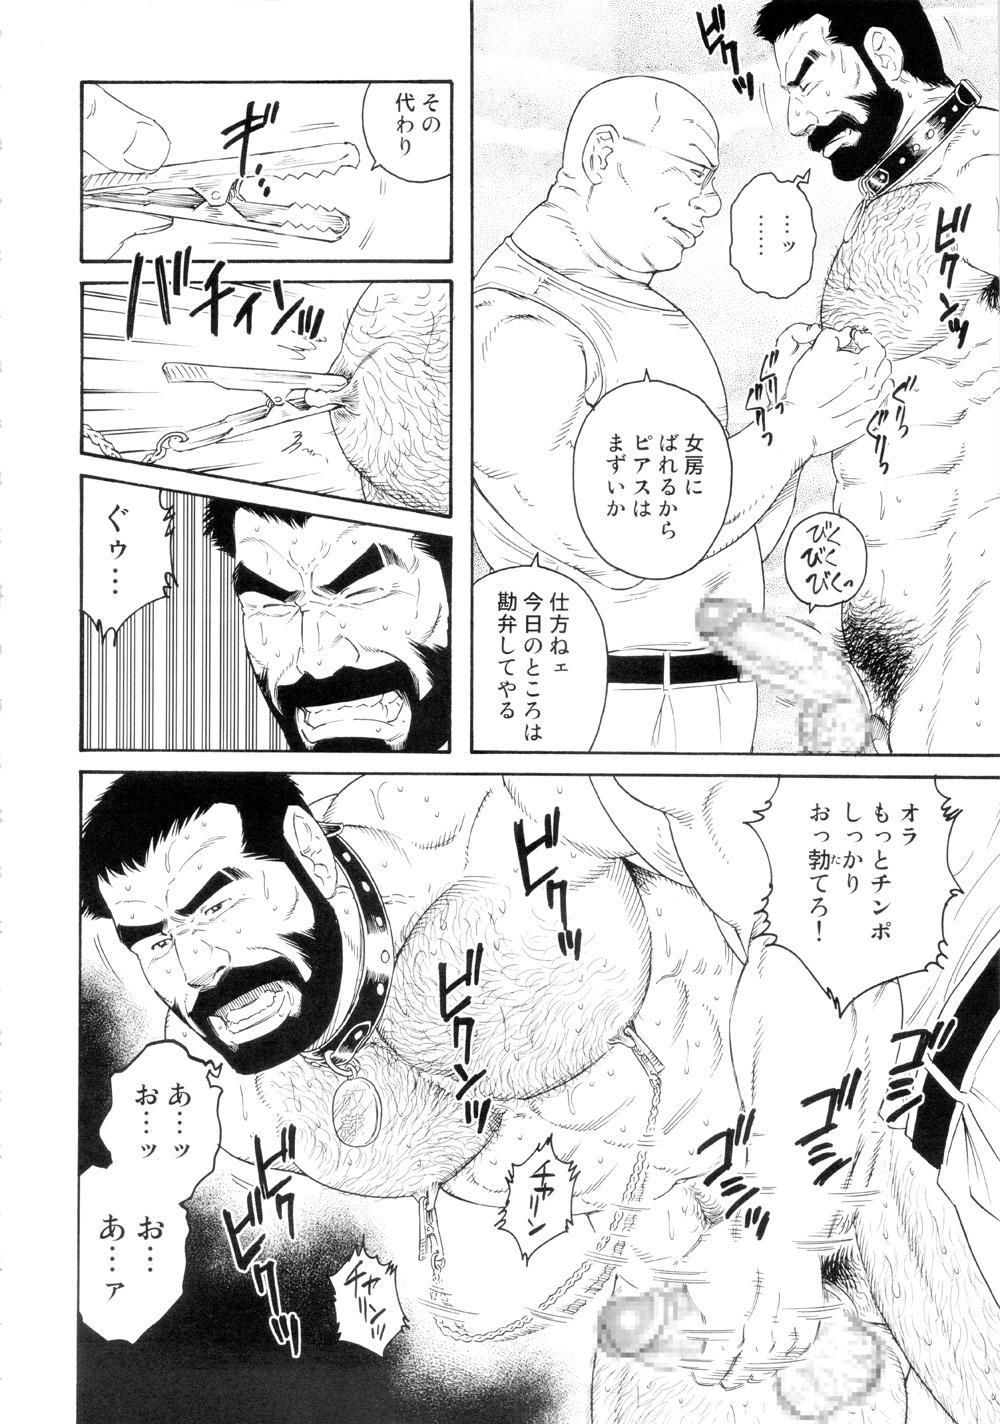 Genryu Chapter 1 9